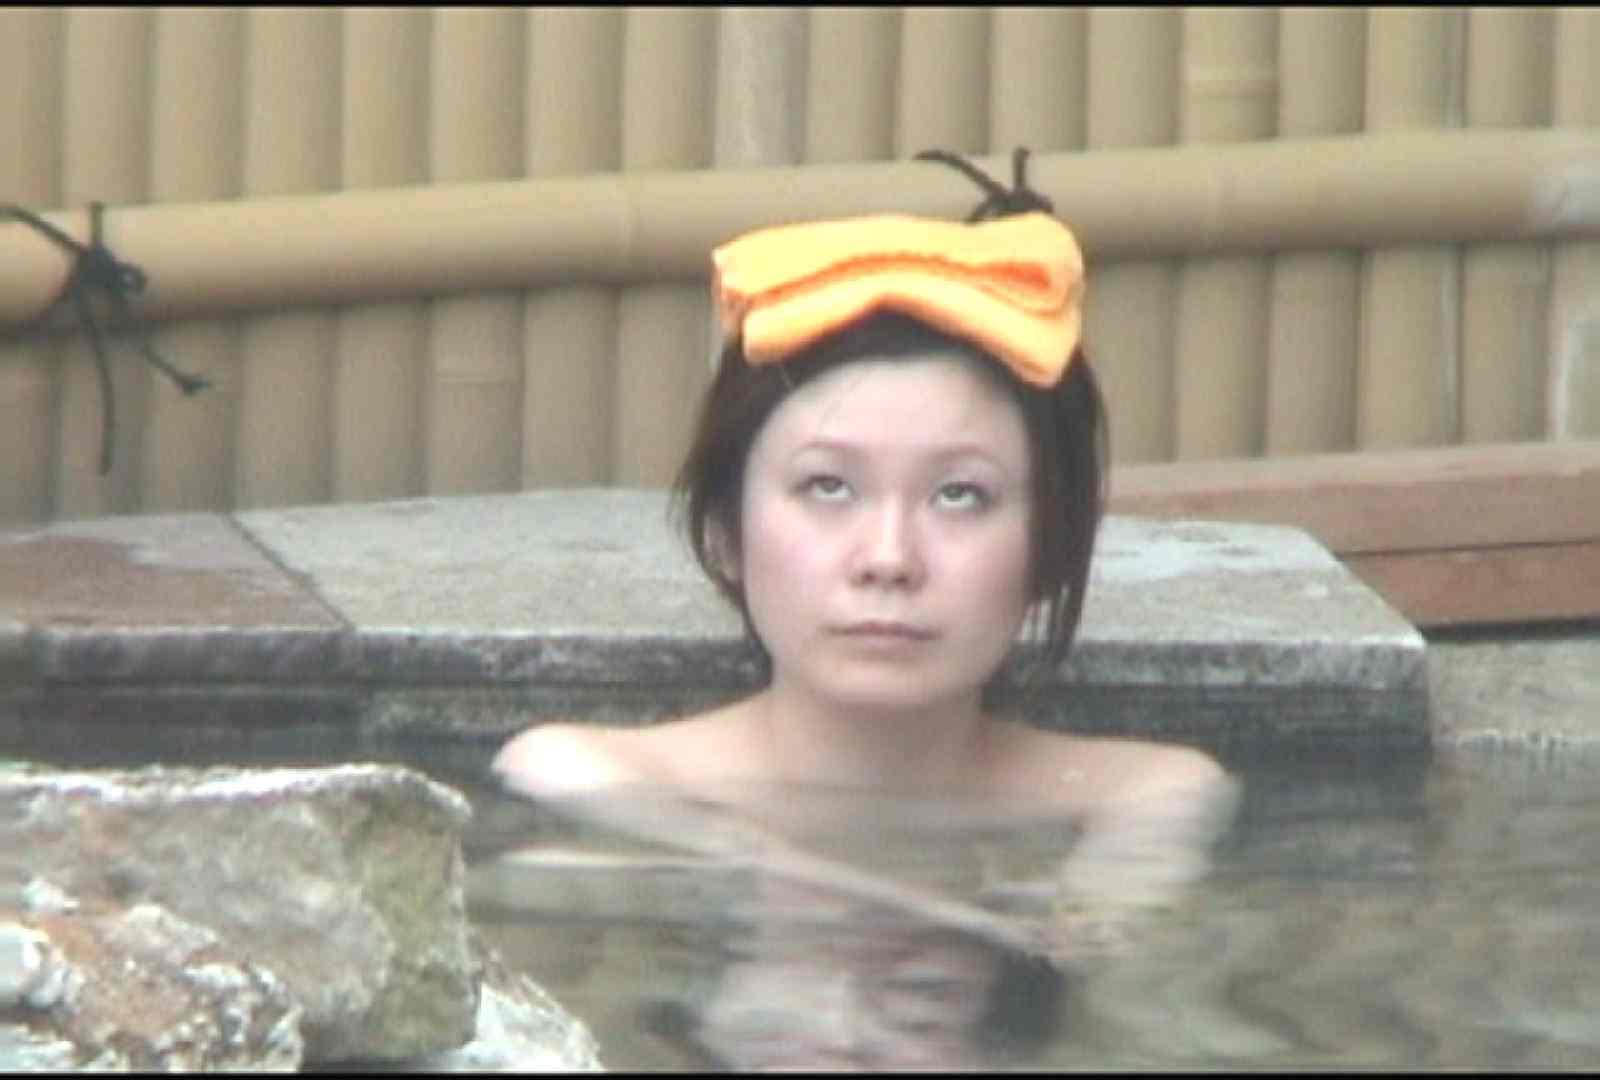 Aquaな露天風呂Vol.177 綺麗なOLたち アダルト動画キャプチャ 112枚 53